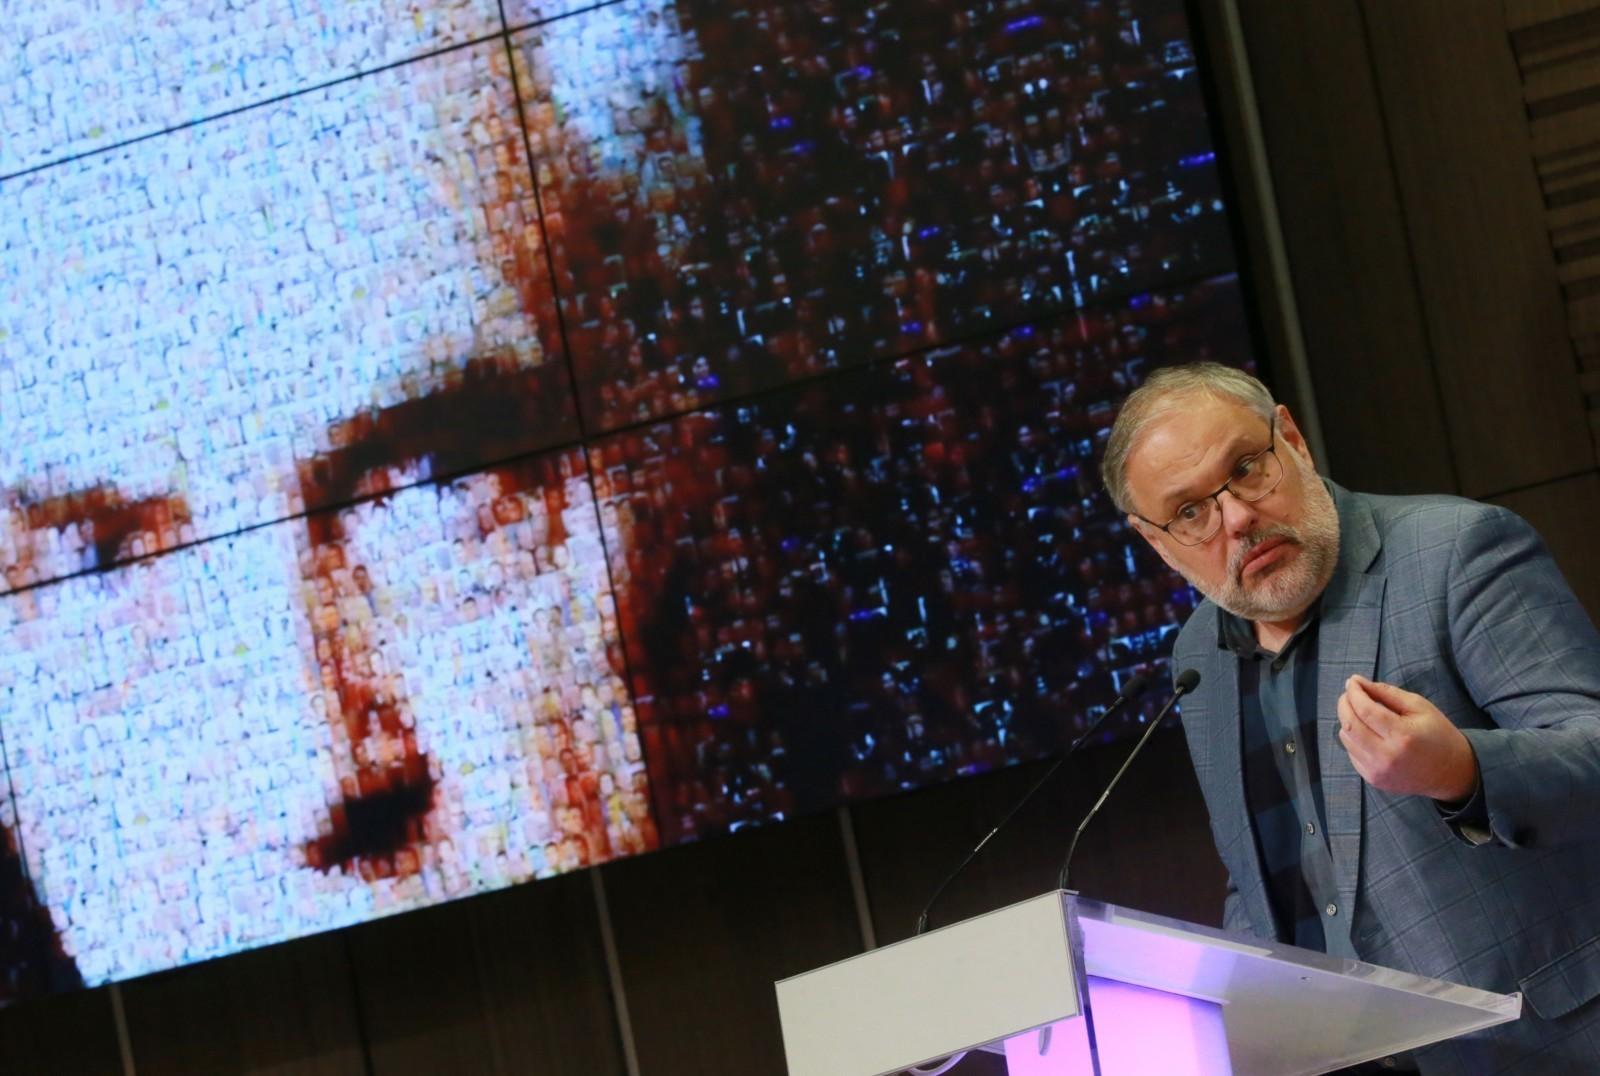 Экономист Михаил Хазин. Александр Натрускин / РИА Новости